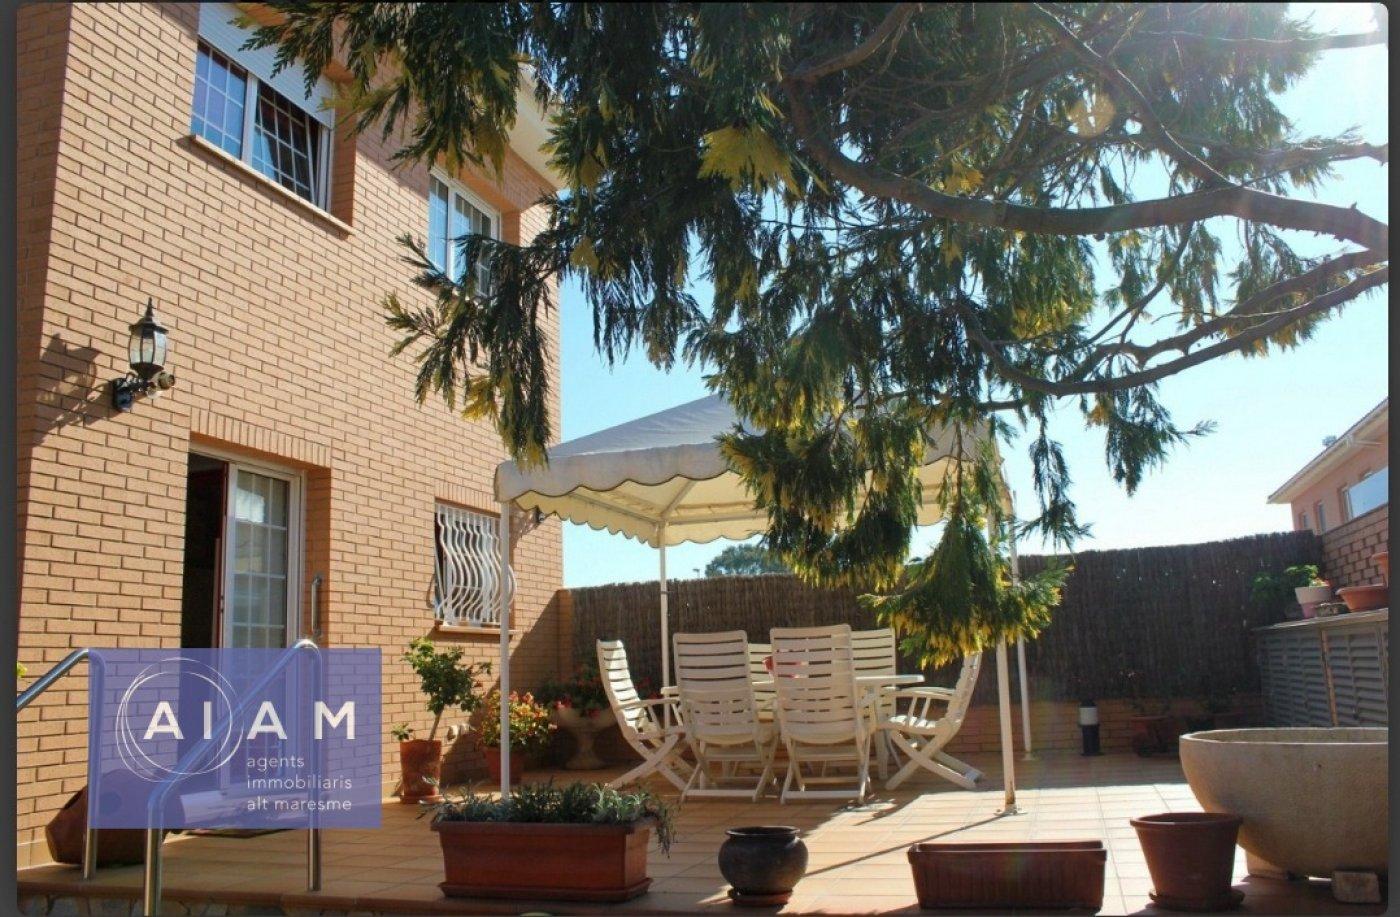 House for sale in Can bel, Pineda de Mar